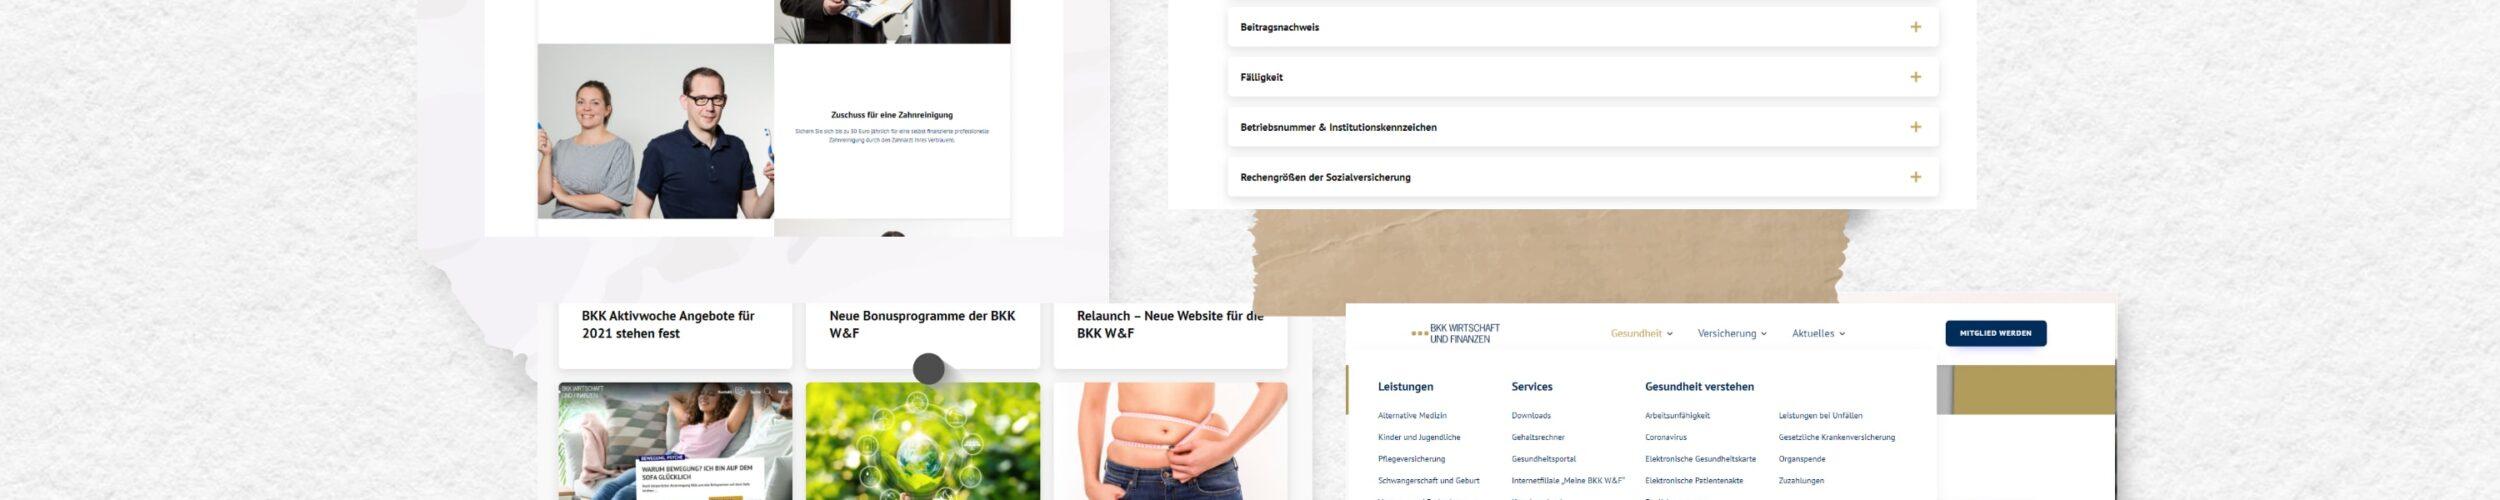 Collage Screenshots BKK W&F